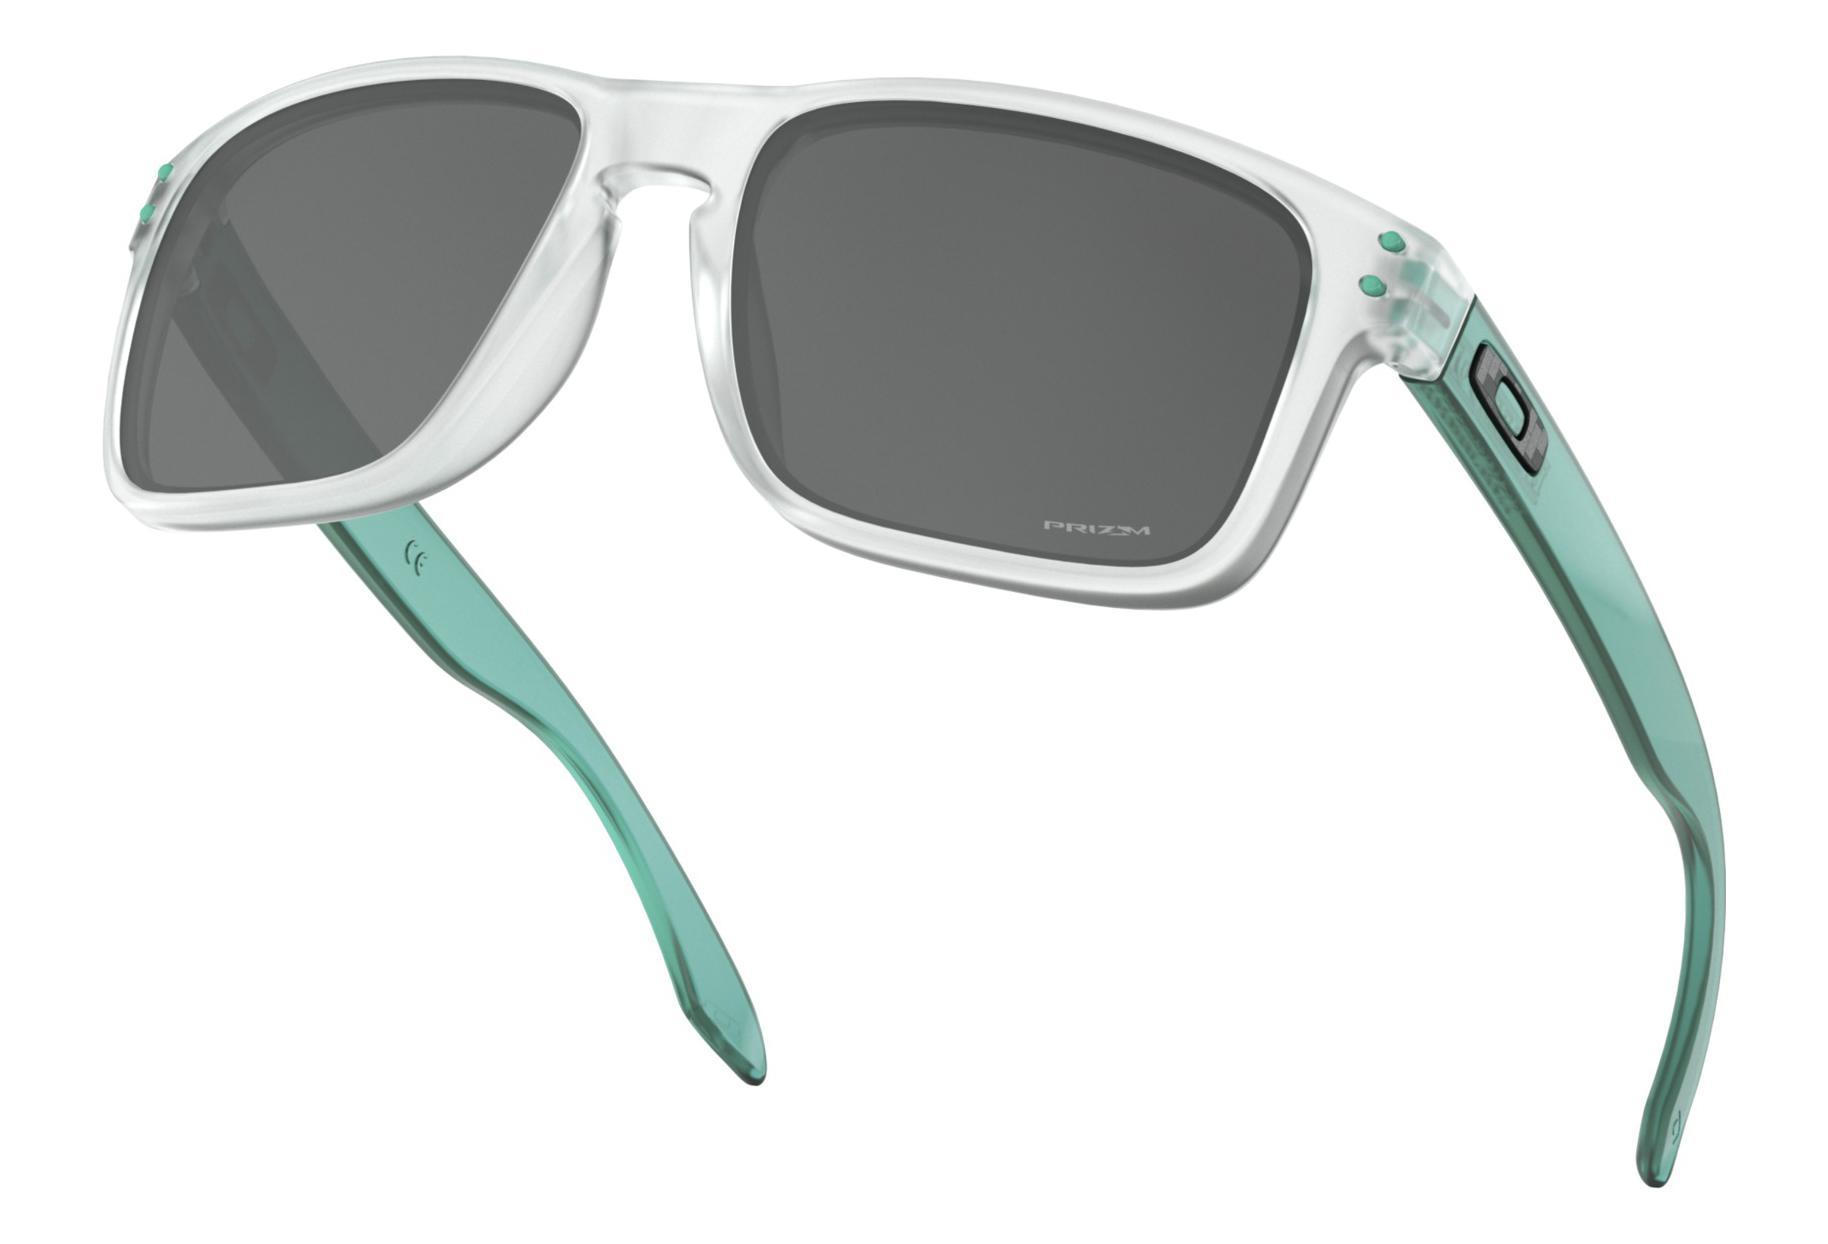 Oakley Sunglasses Crystal Pop Holbrook Crystal Clear   Prizm Black   Ref.  OO9102-H655 a7c468e8cf5e